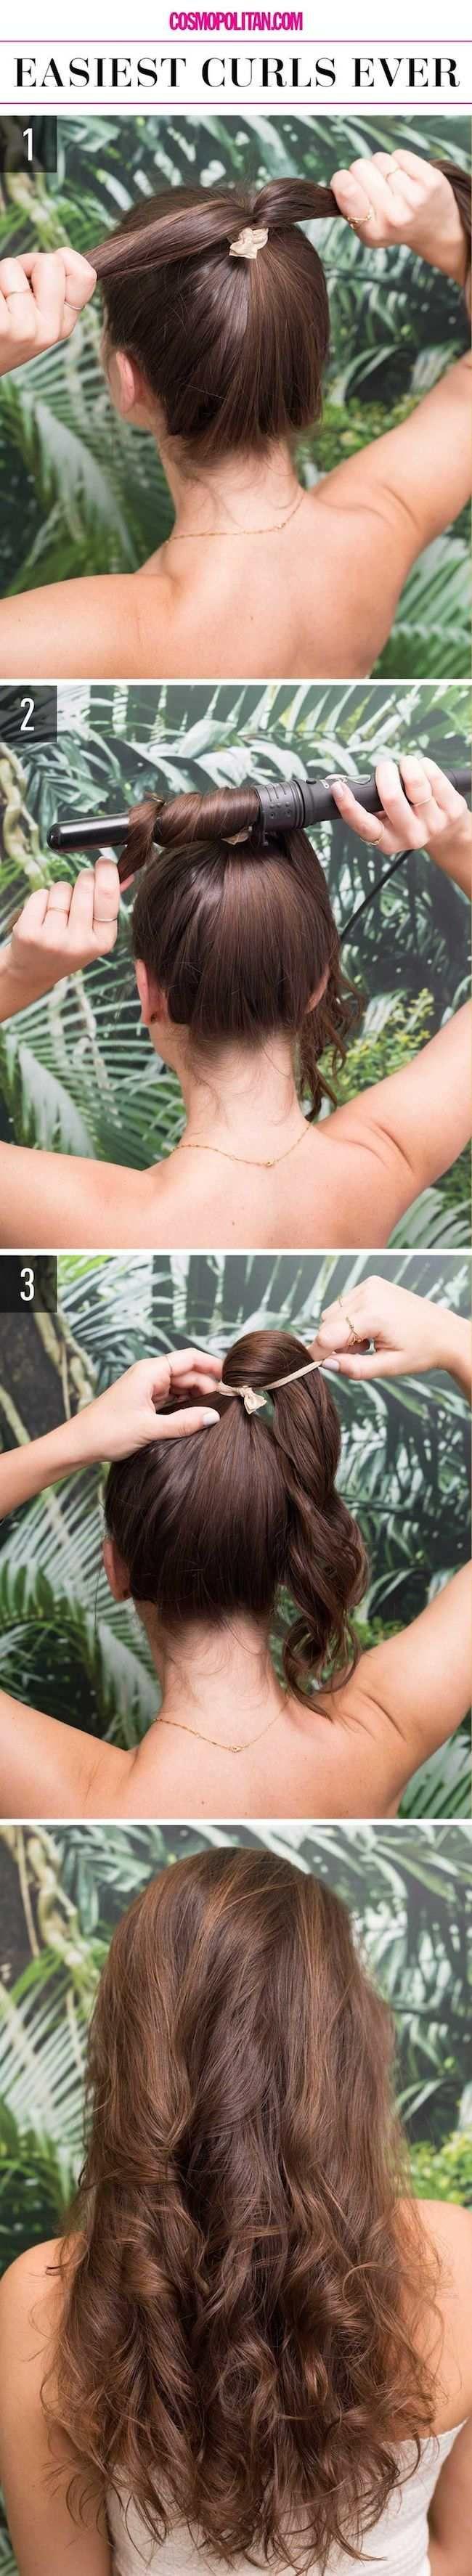 Instant beach waves, perfect destination wedding hairstyle idea! Image via Cosmopolitan